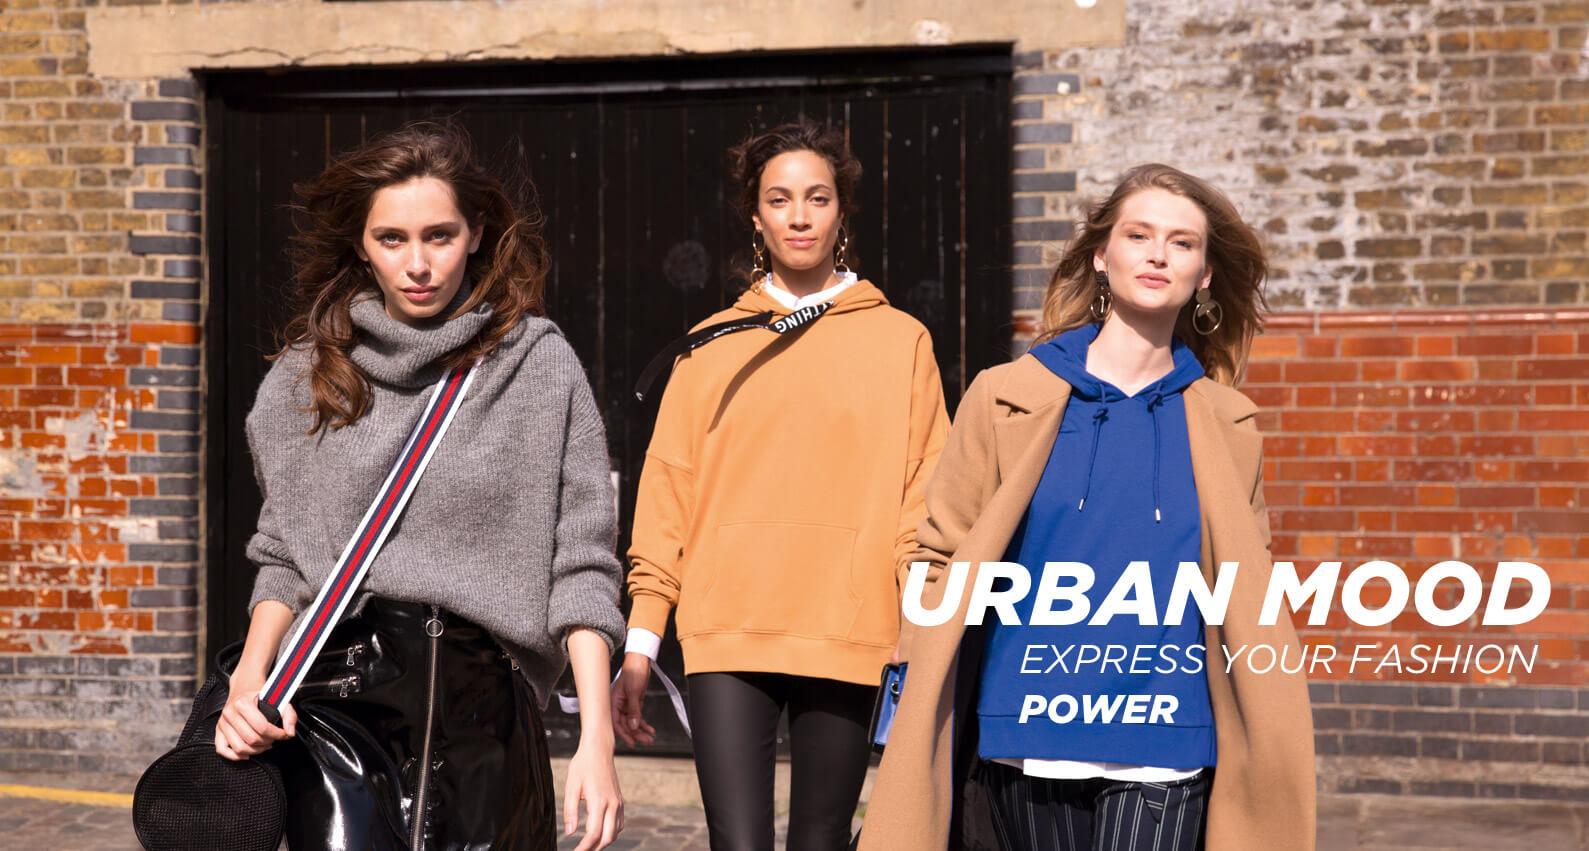 PIMKIE Urban Mood EXPRESS YOUR FASHION POWER